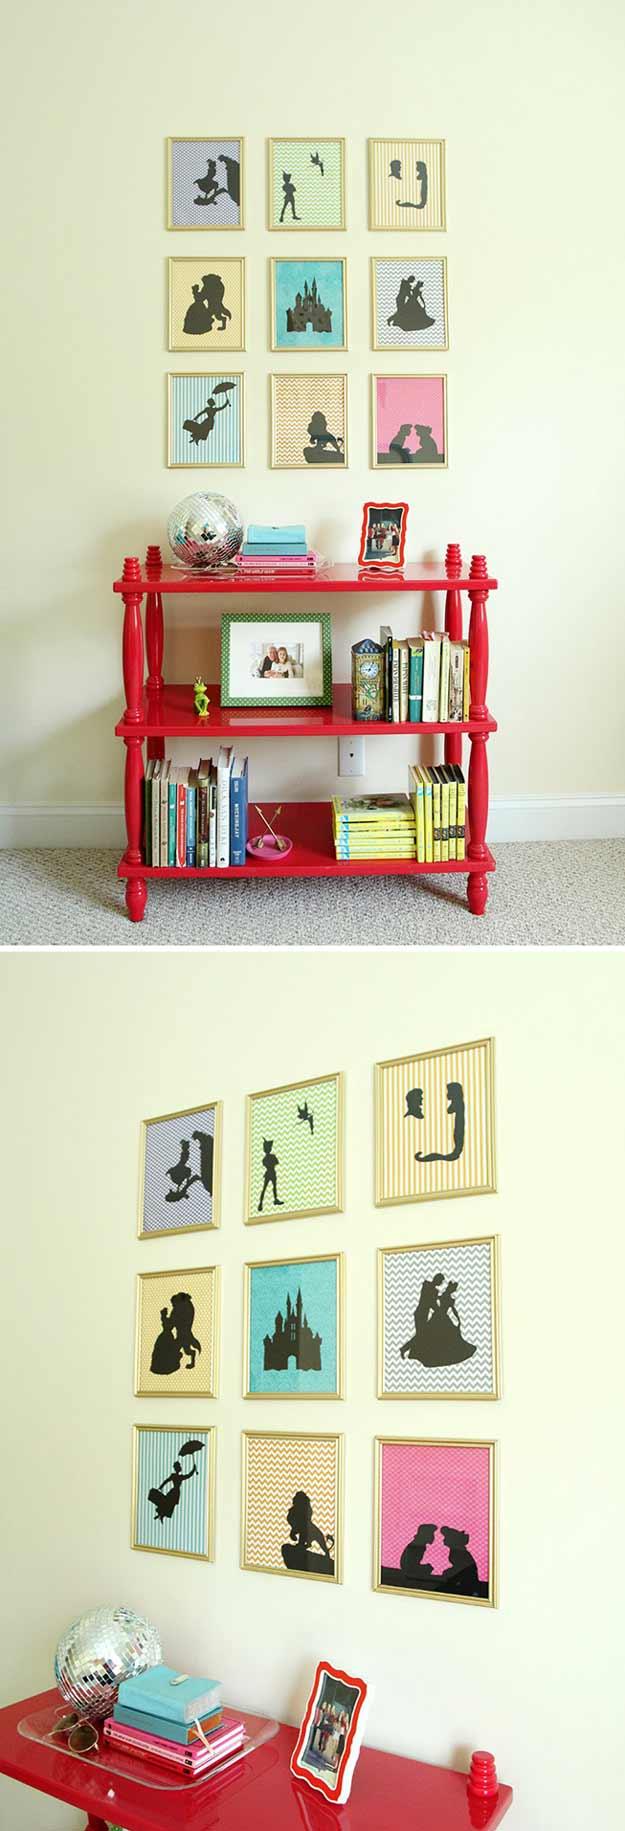 Best Kitchen Gallery: Disney Bedroom Designs For Teens Diy Projects Craft Ideas How To's of Room Ideas Diy  on rachelxblog.com